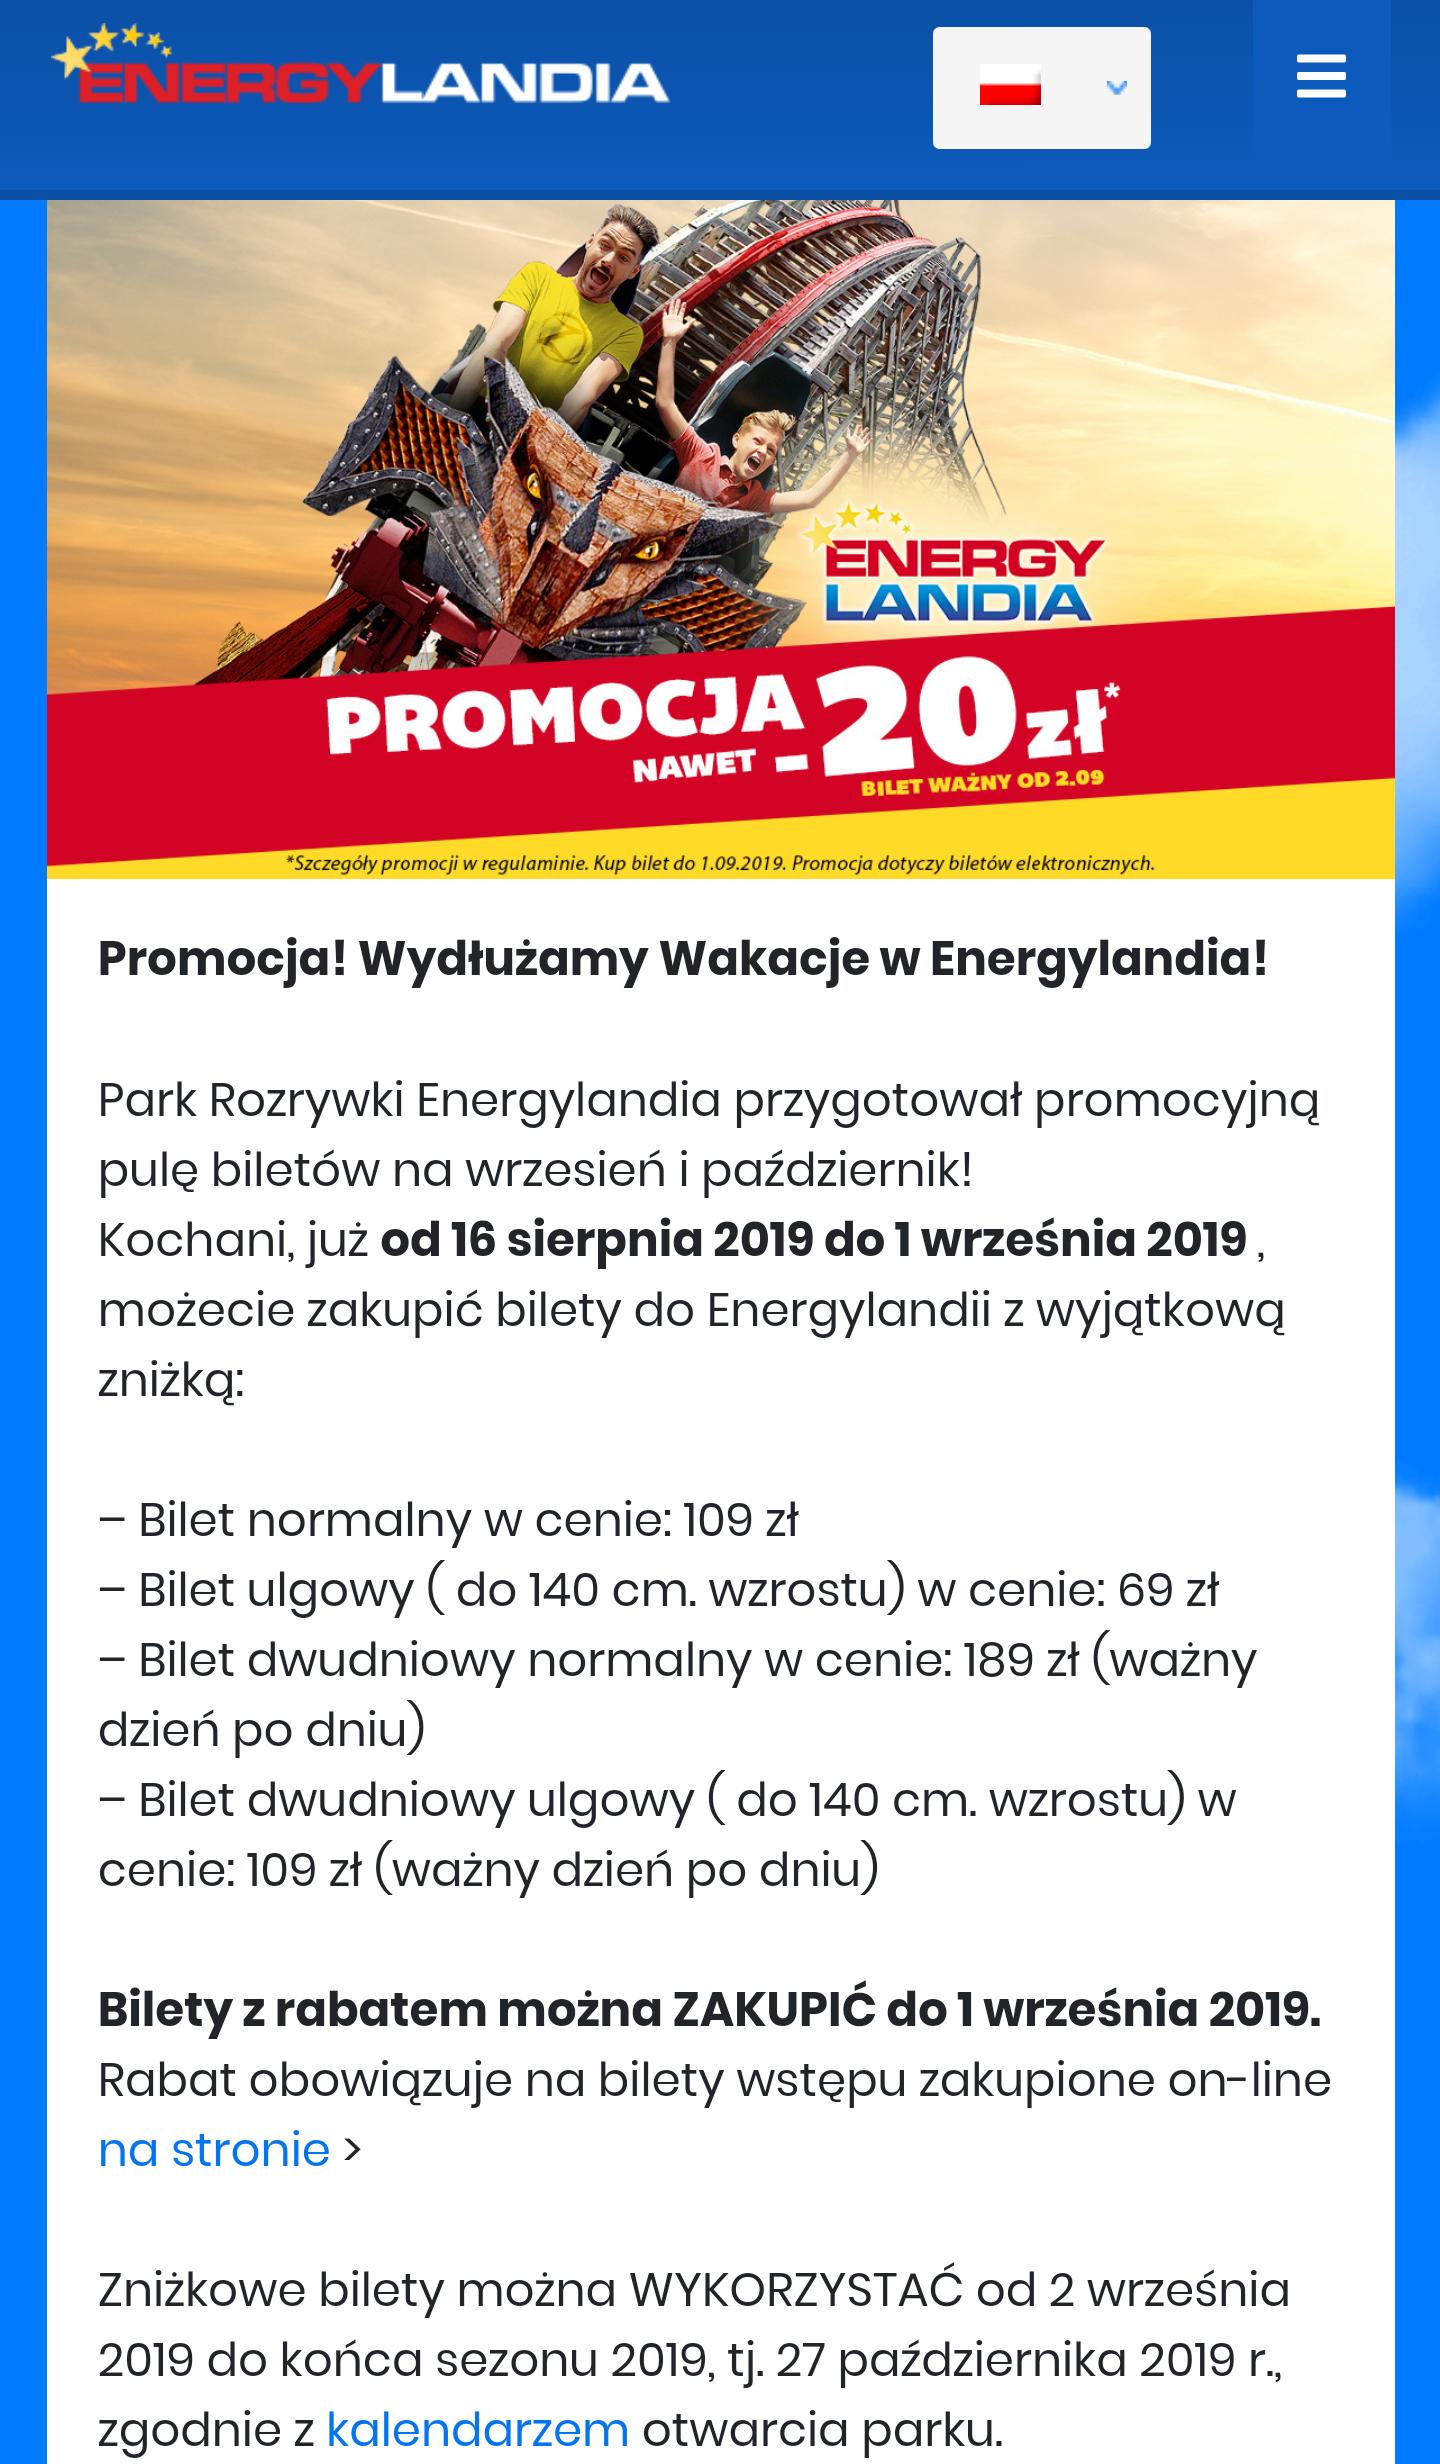 Energylandia bilet online -20zl